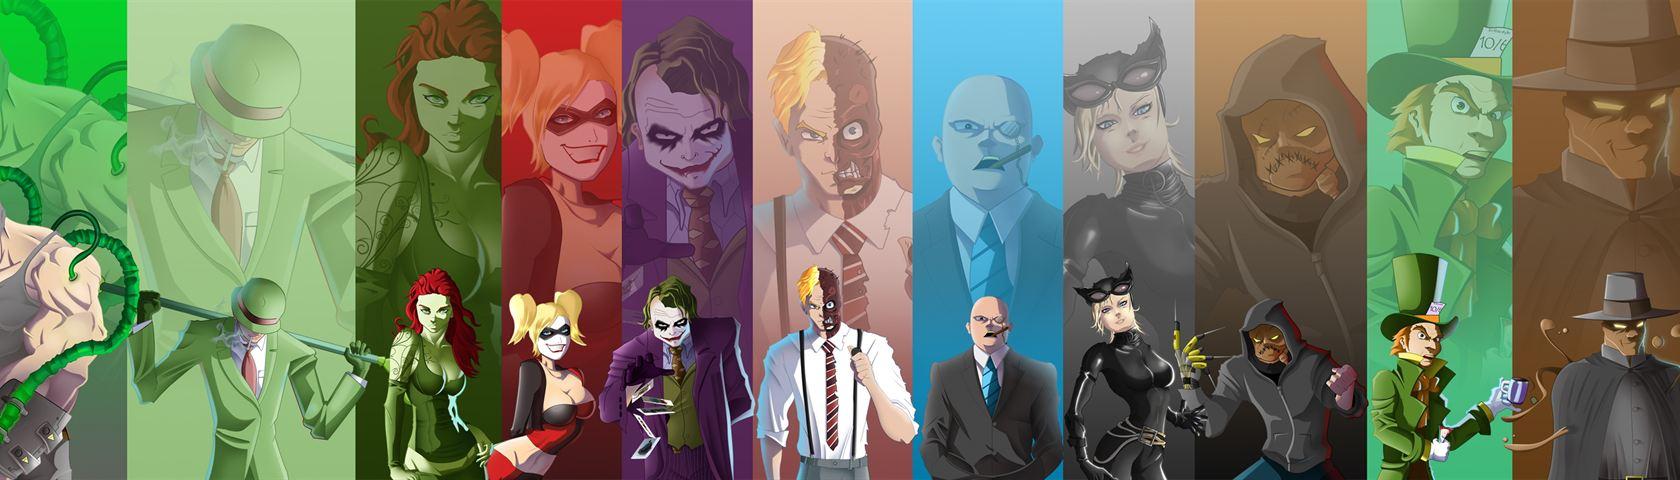 Animated Dual Screen Wallpaper Batman Villains Images Wallpaperfusion By Binary